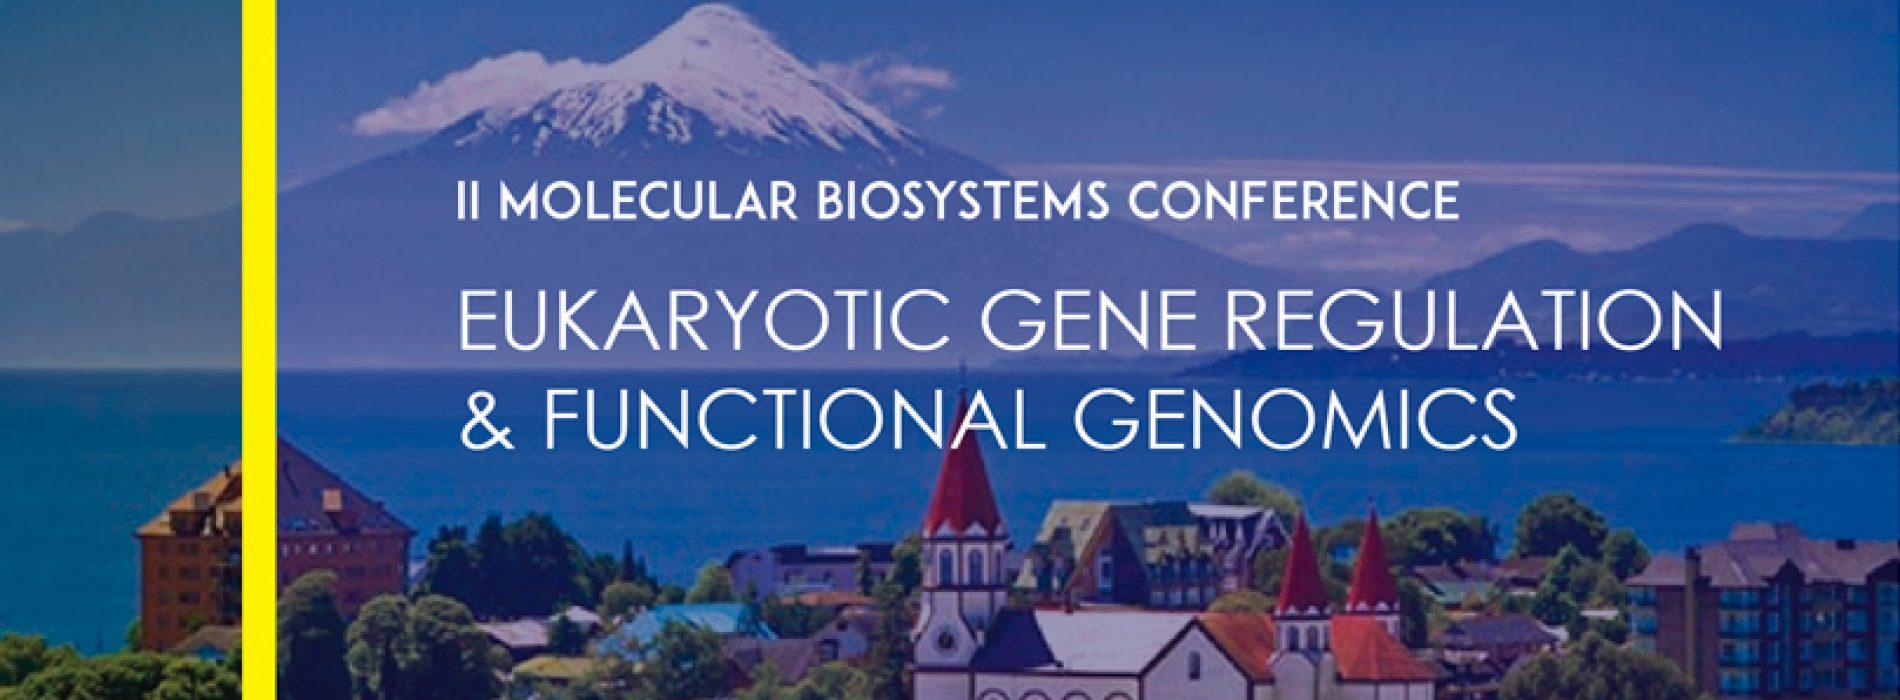 II Molecular Biosystems Conference Eukaryotic Gene Regulation and Functional Genomics